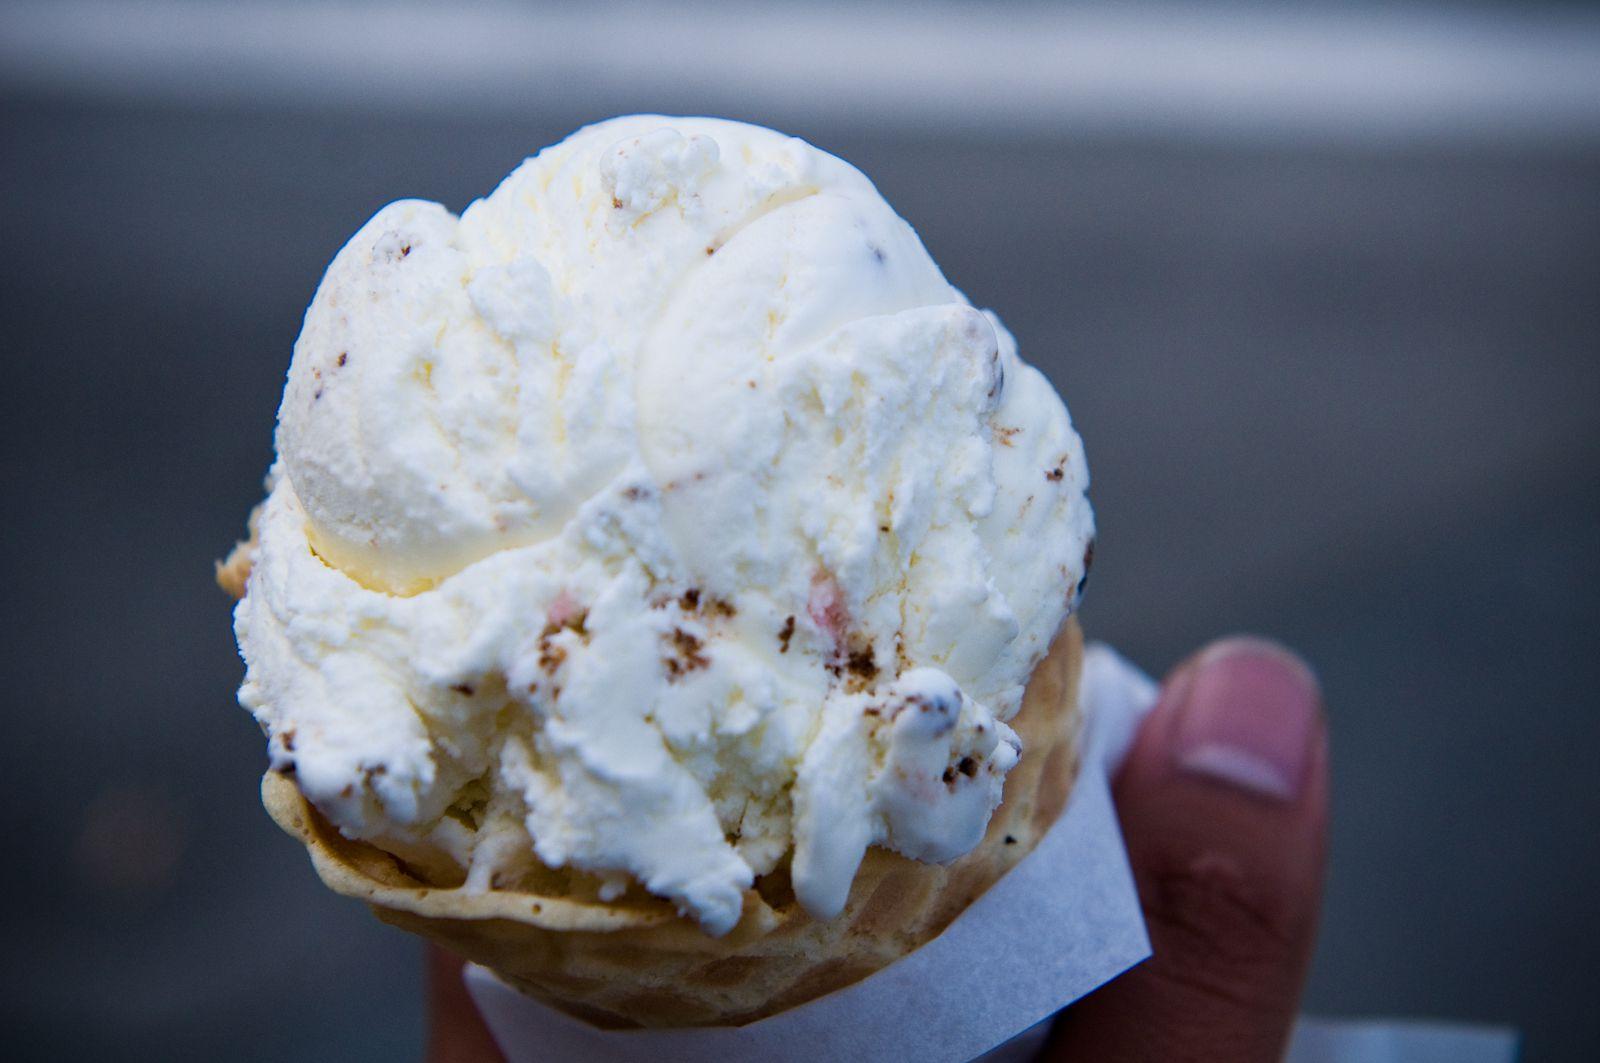 Molly Moon Ice Cream